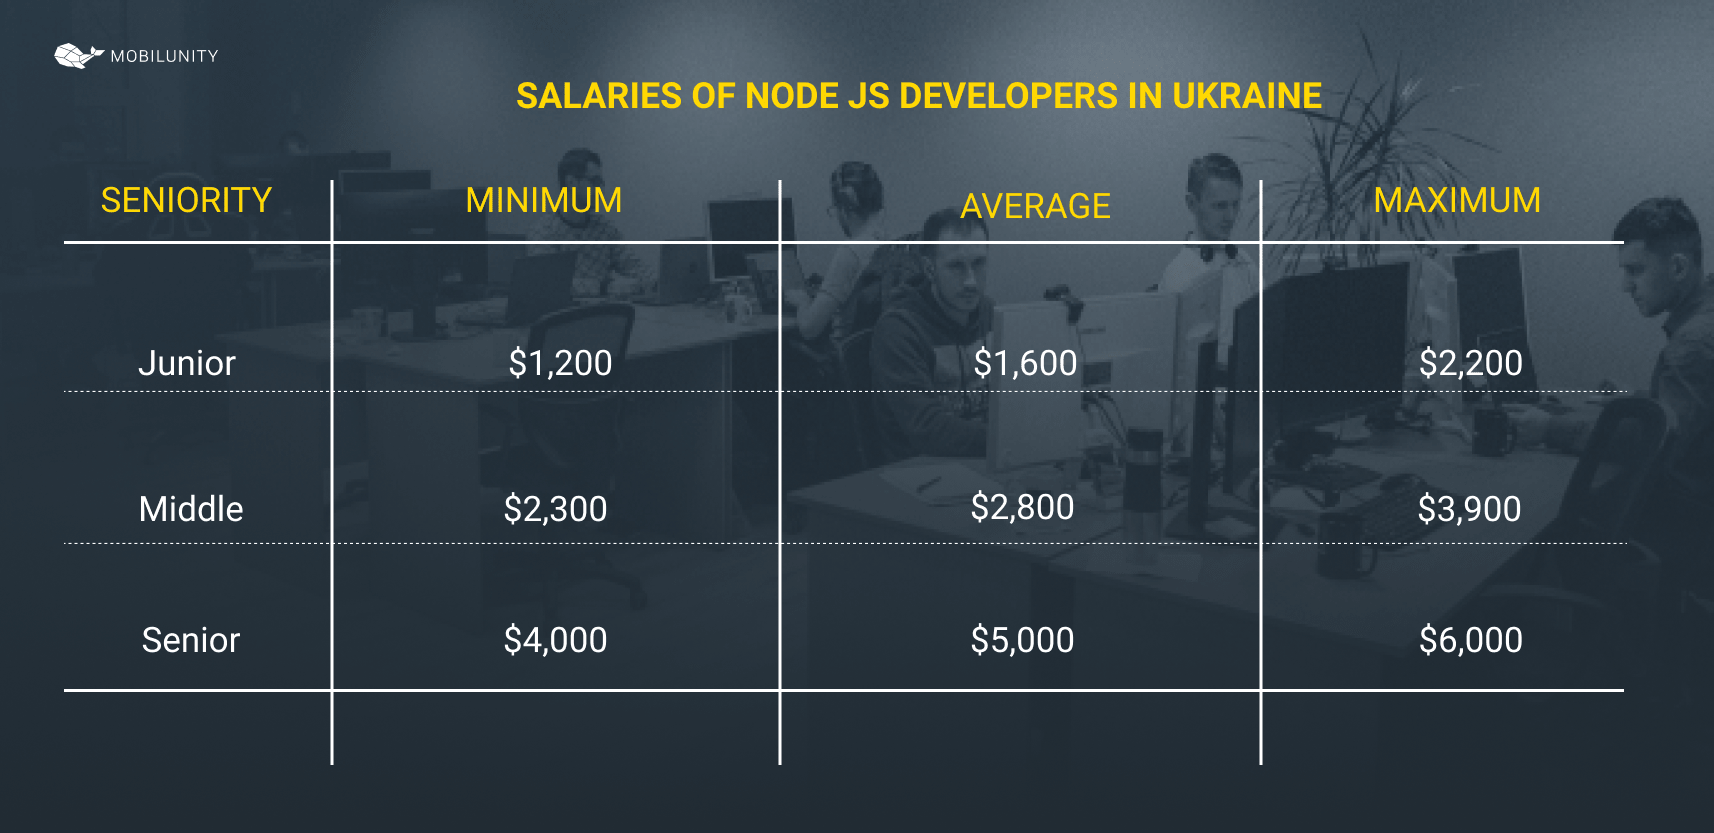 Node.js developer salary in Ukraine